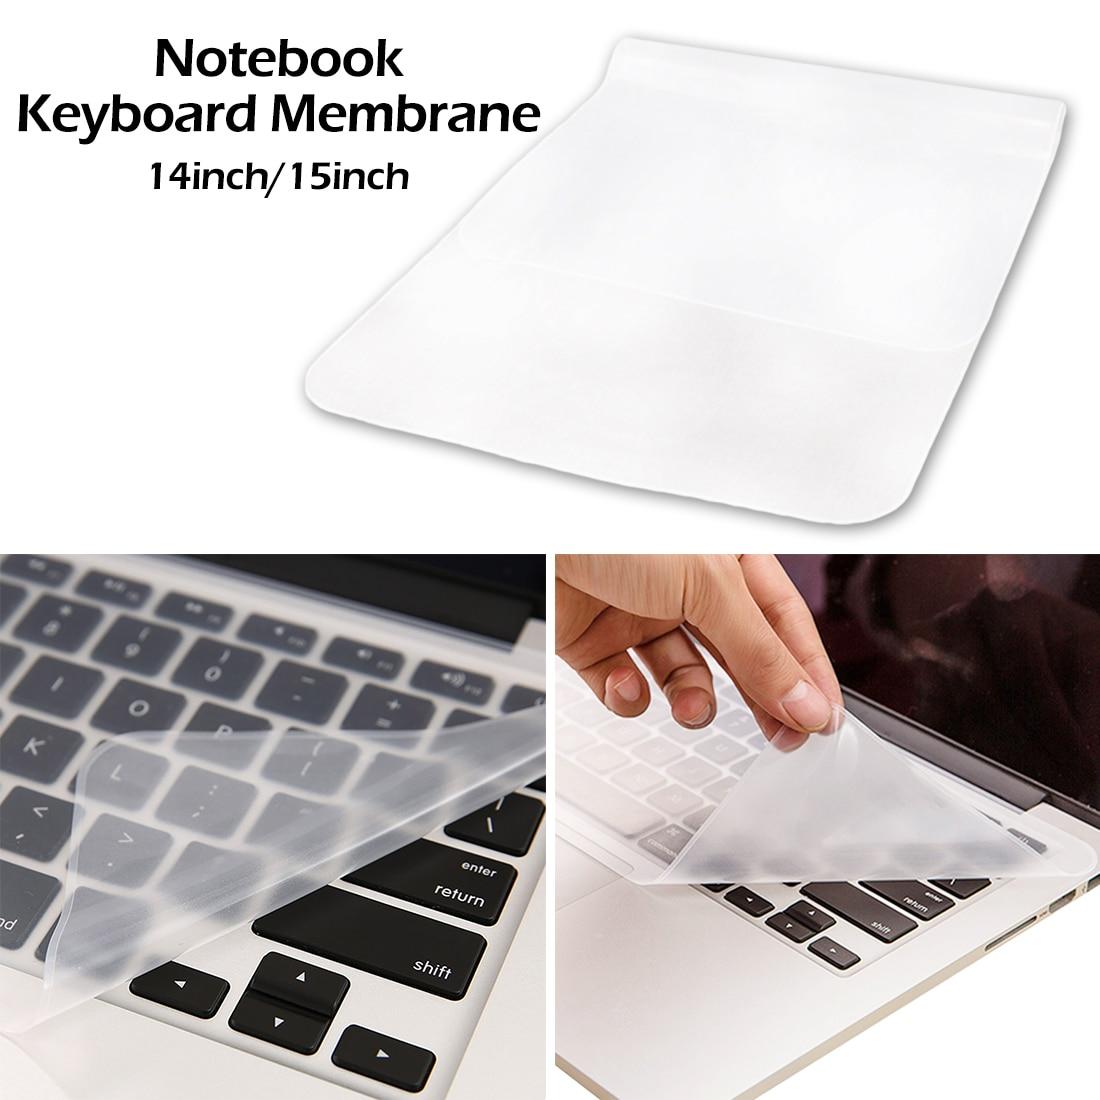 Dustproof transparente ultra-fino silicone teclado capa 14 15 polegada universal silicone teclado protetor filme para computador portátil